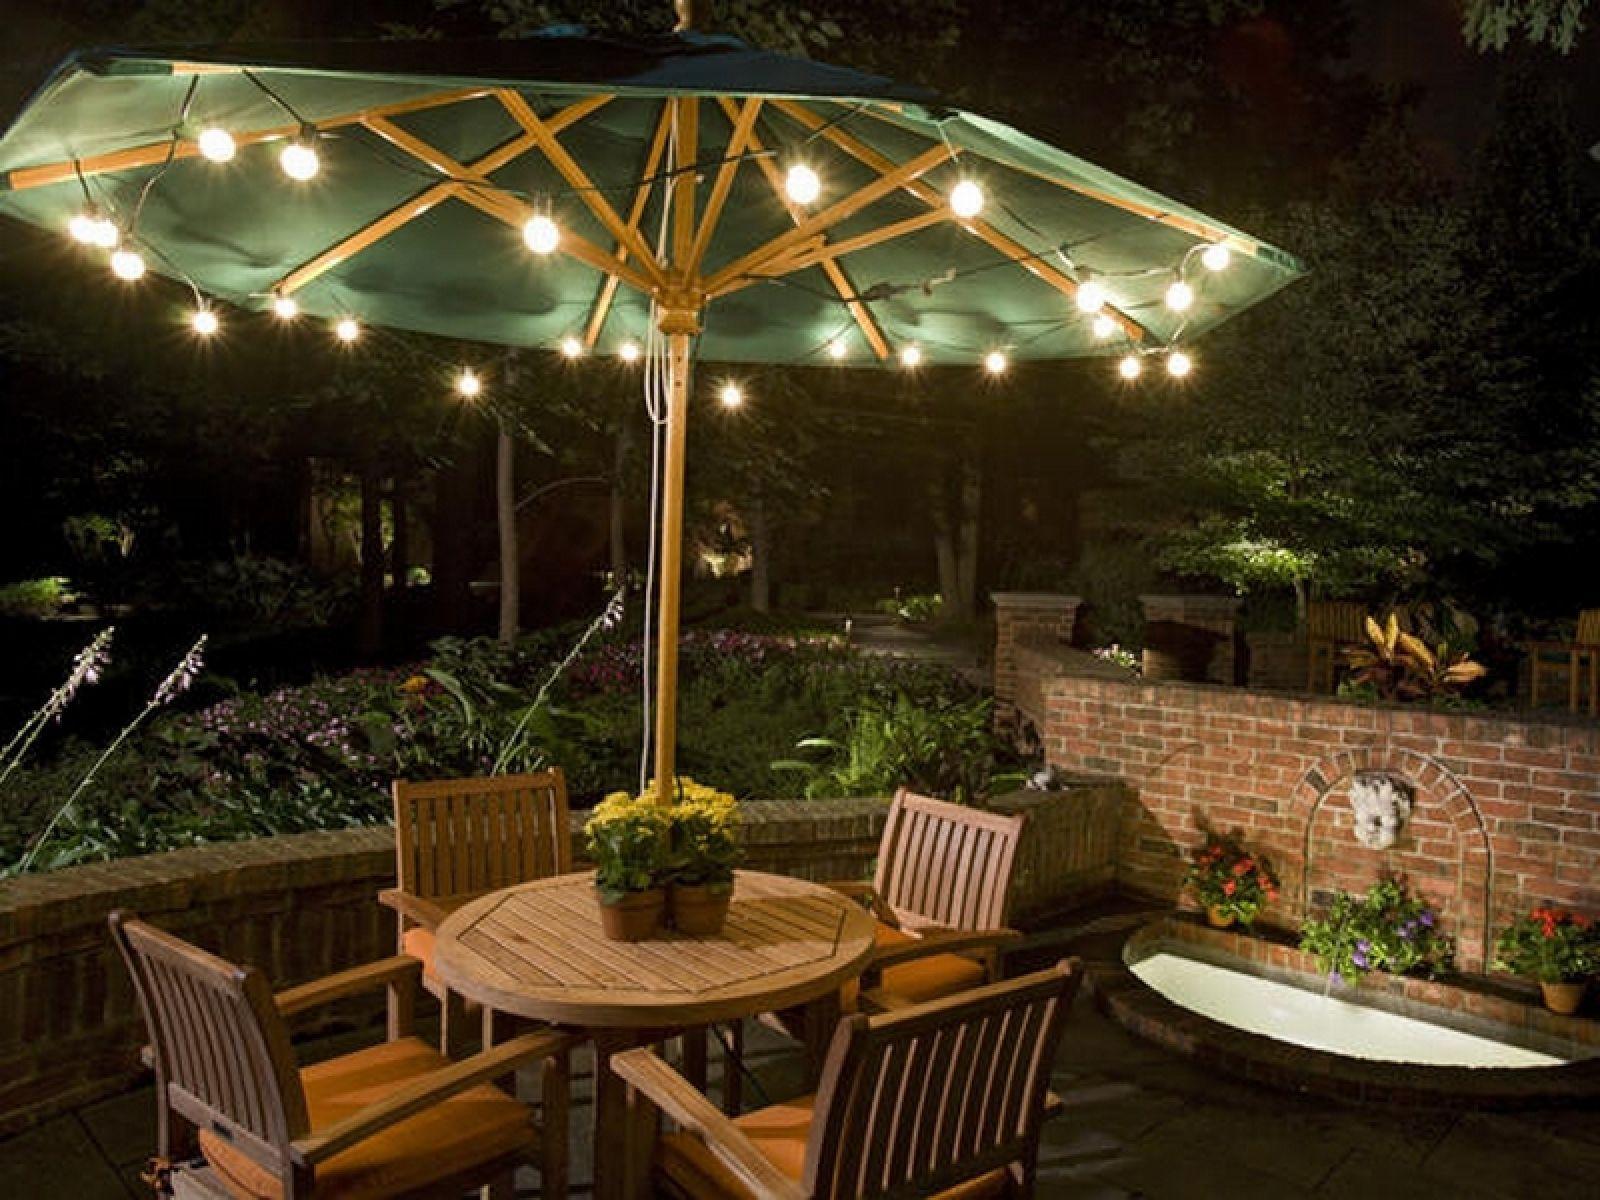 Diff Idea To Use The Underside Of The Patio Umbrella Outdoor Patio Lights Outdoor Landscape Lighting Outdoor Lighting Design